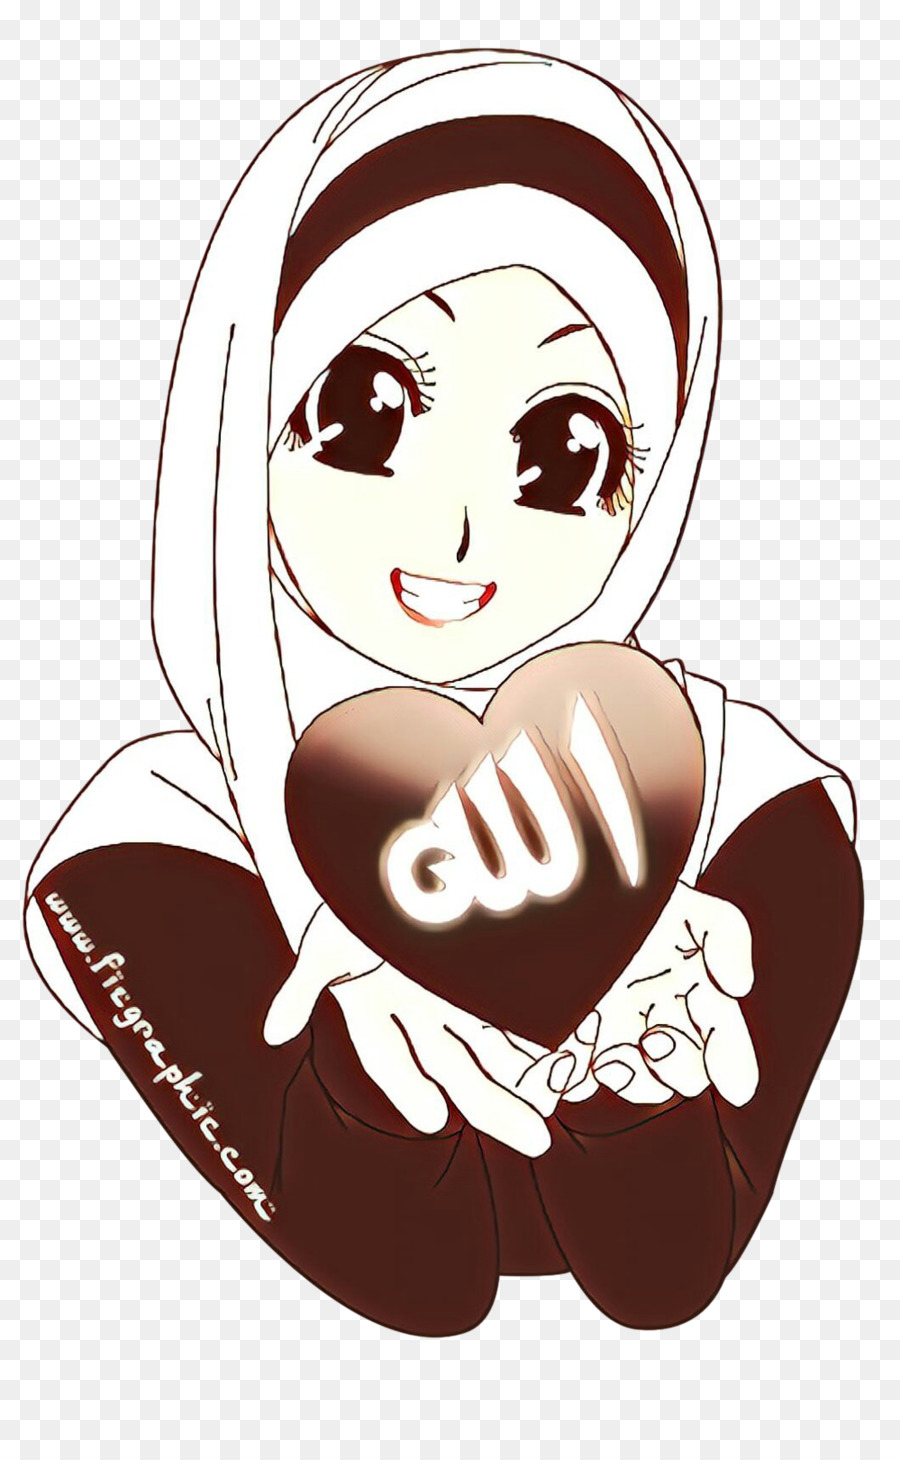 Quran Jilbab Kartun Gambar Png